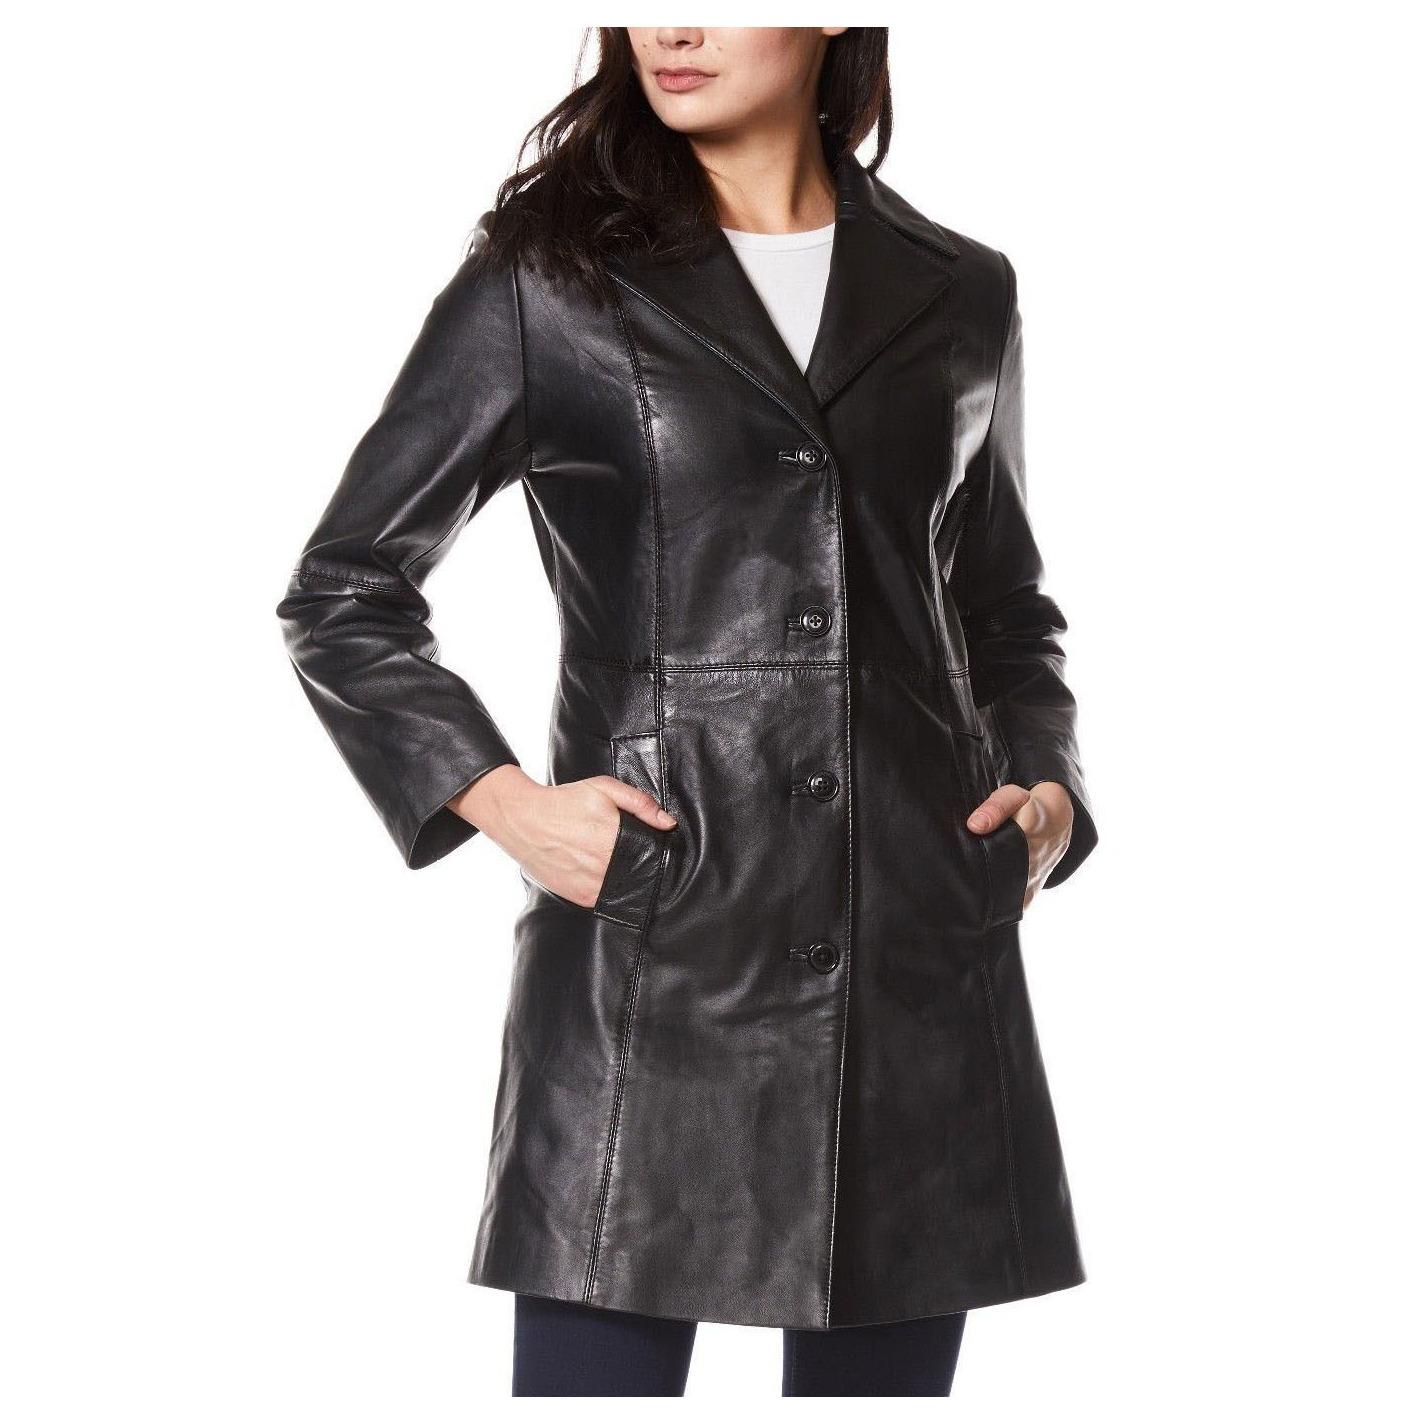 c3652d283 Dámsky Kožený Kabát Cassandra Čierny. Loading zoom